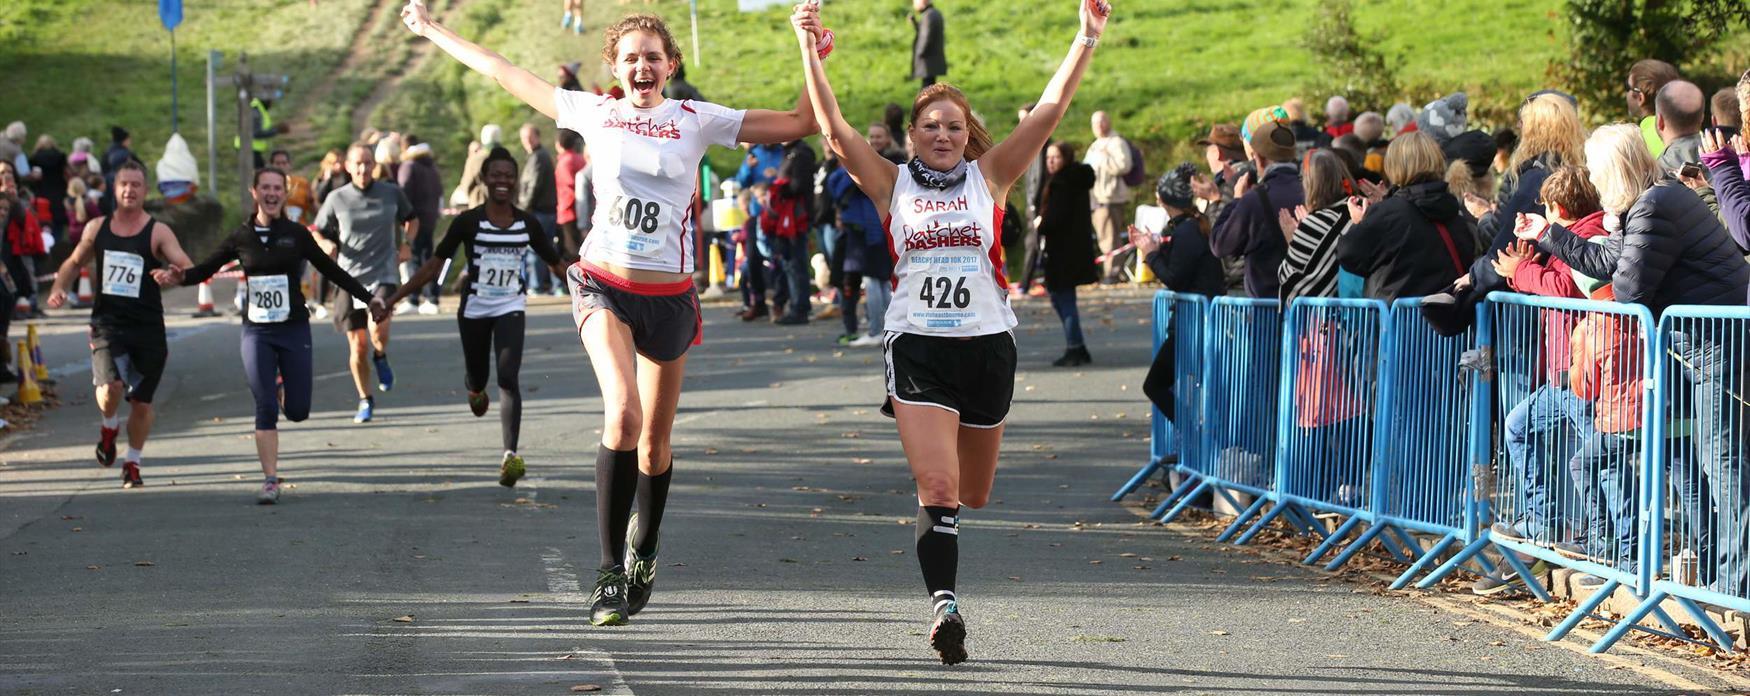 That finish line feeling